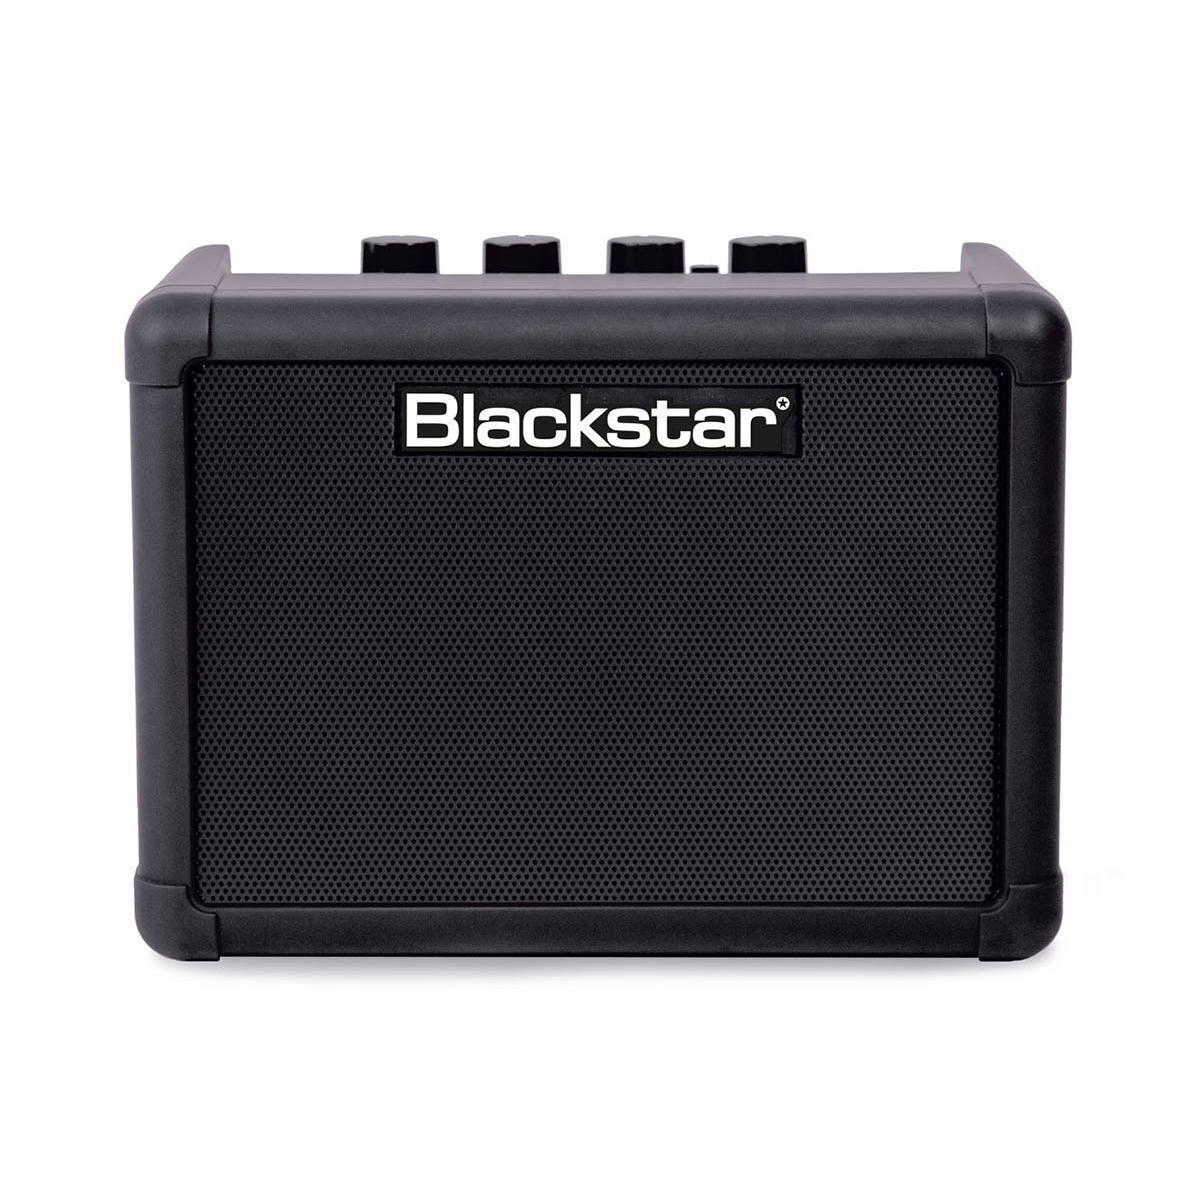 Blackstar - Fly 3 - Mini ampli à piles